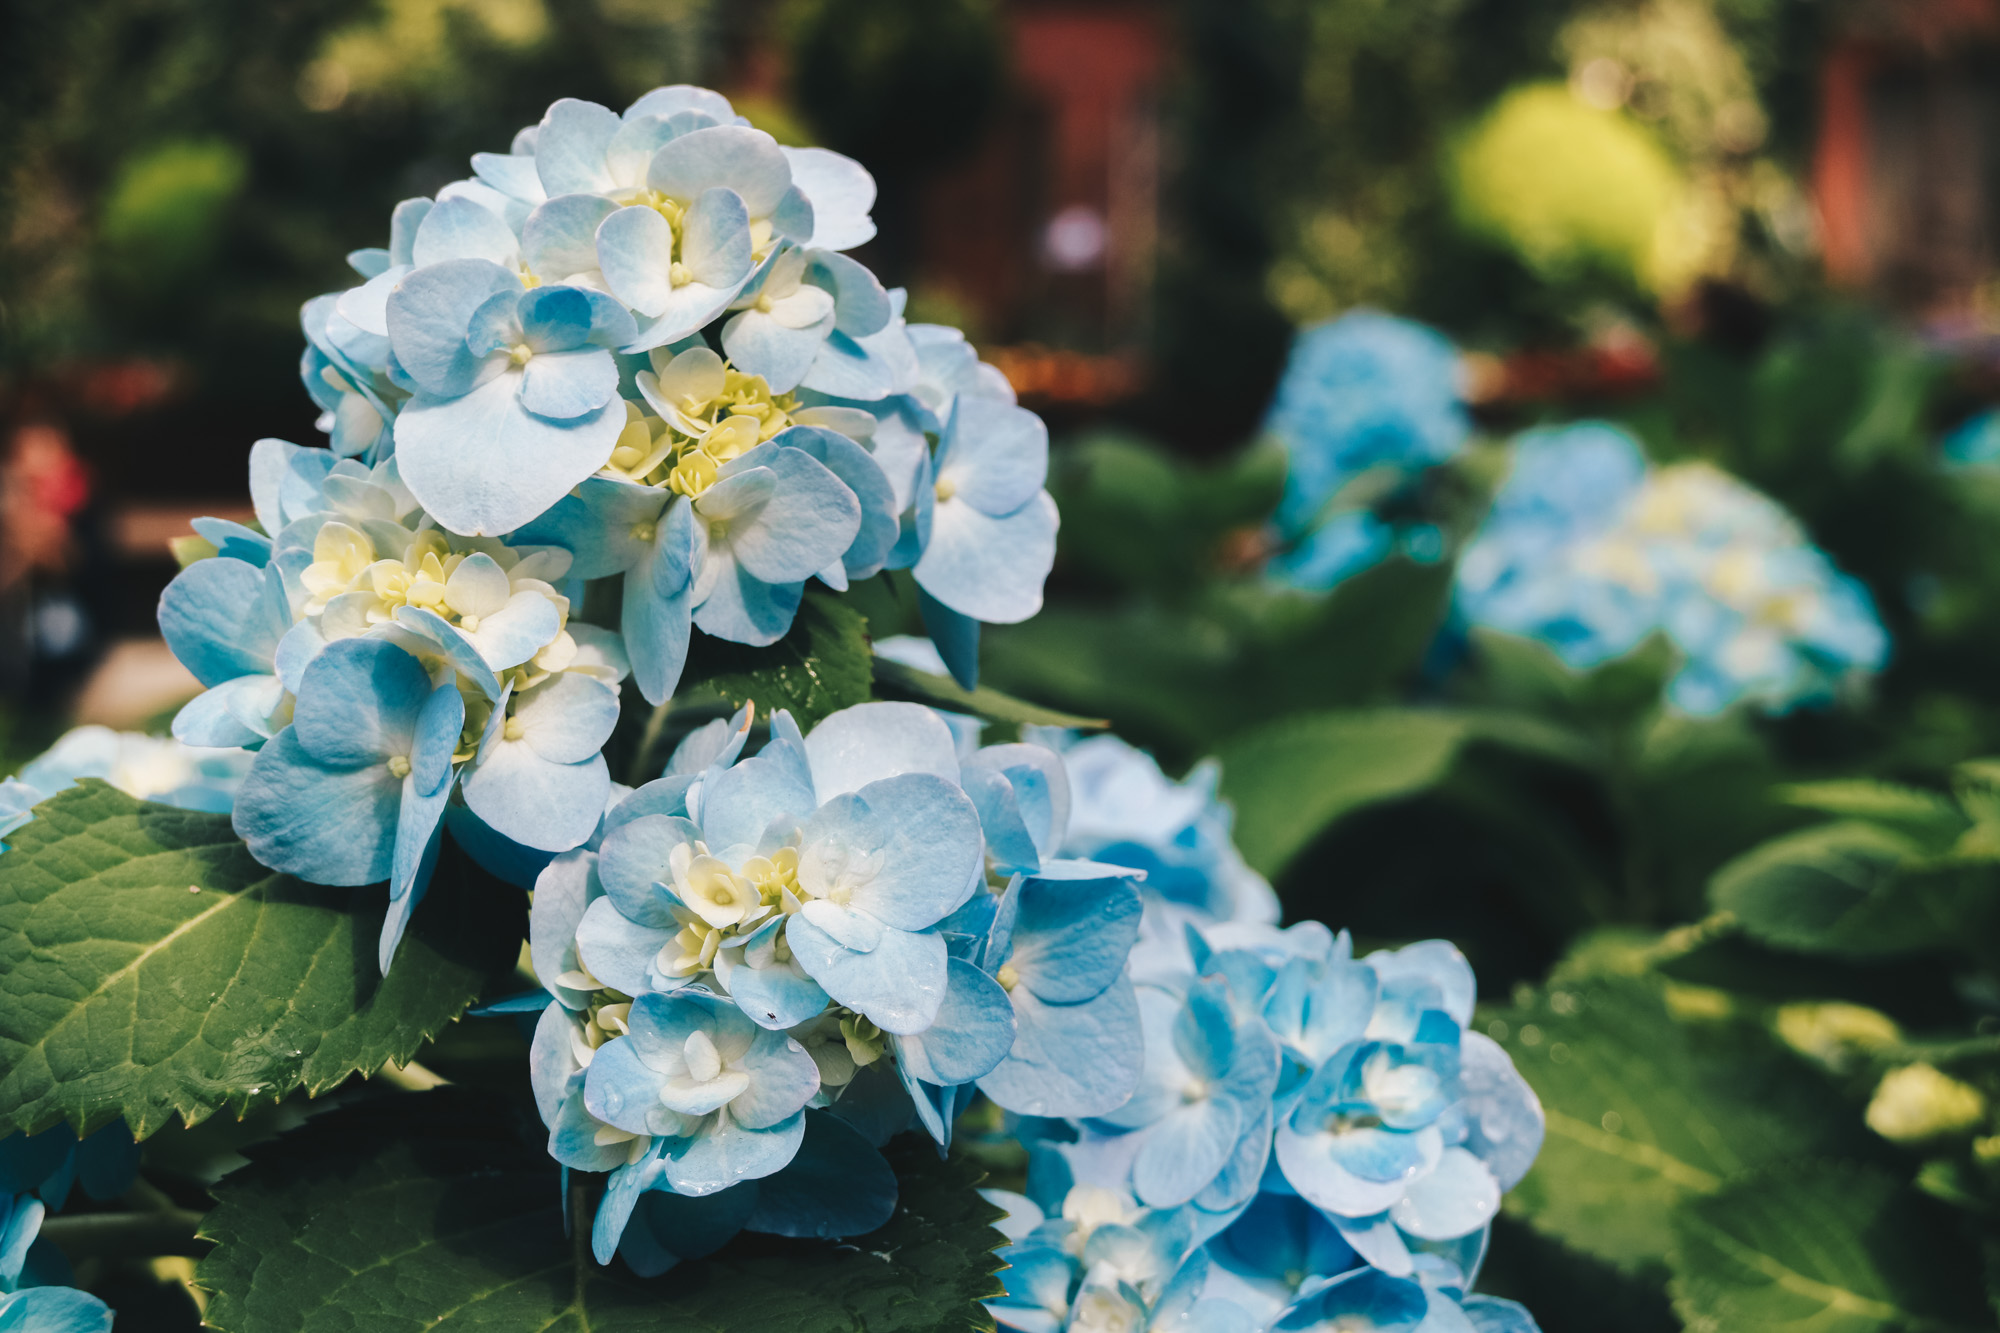 Blue-beauties-floral-display-gardensbythebay-darrenbloggie9